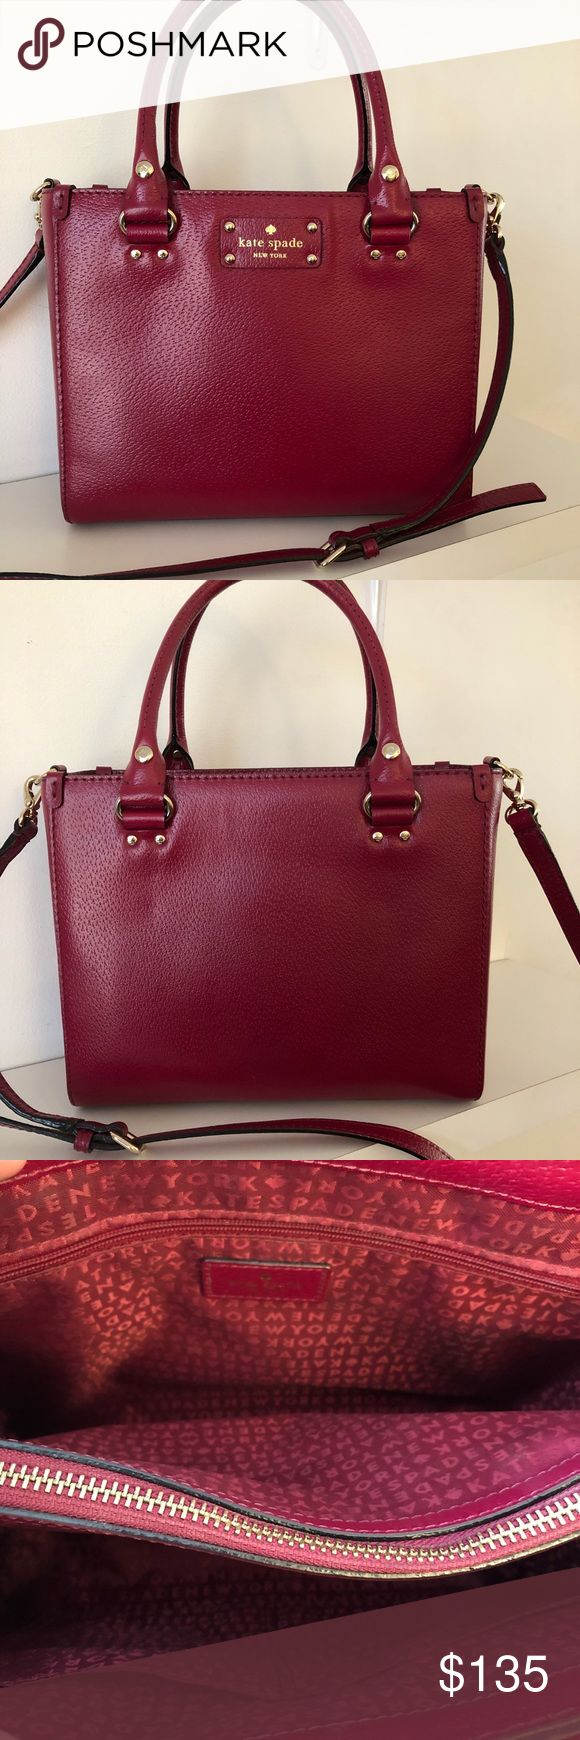 "Kate Spade Wellesley Quinn Bag Kate Spade Wellesley Quinn bag in burgundy! This bag measures 8.5"" in height and 10.5"" in length. Gorgeous bag in great condition! kate spade Bags Crossbody Bags"